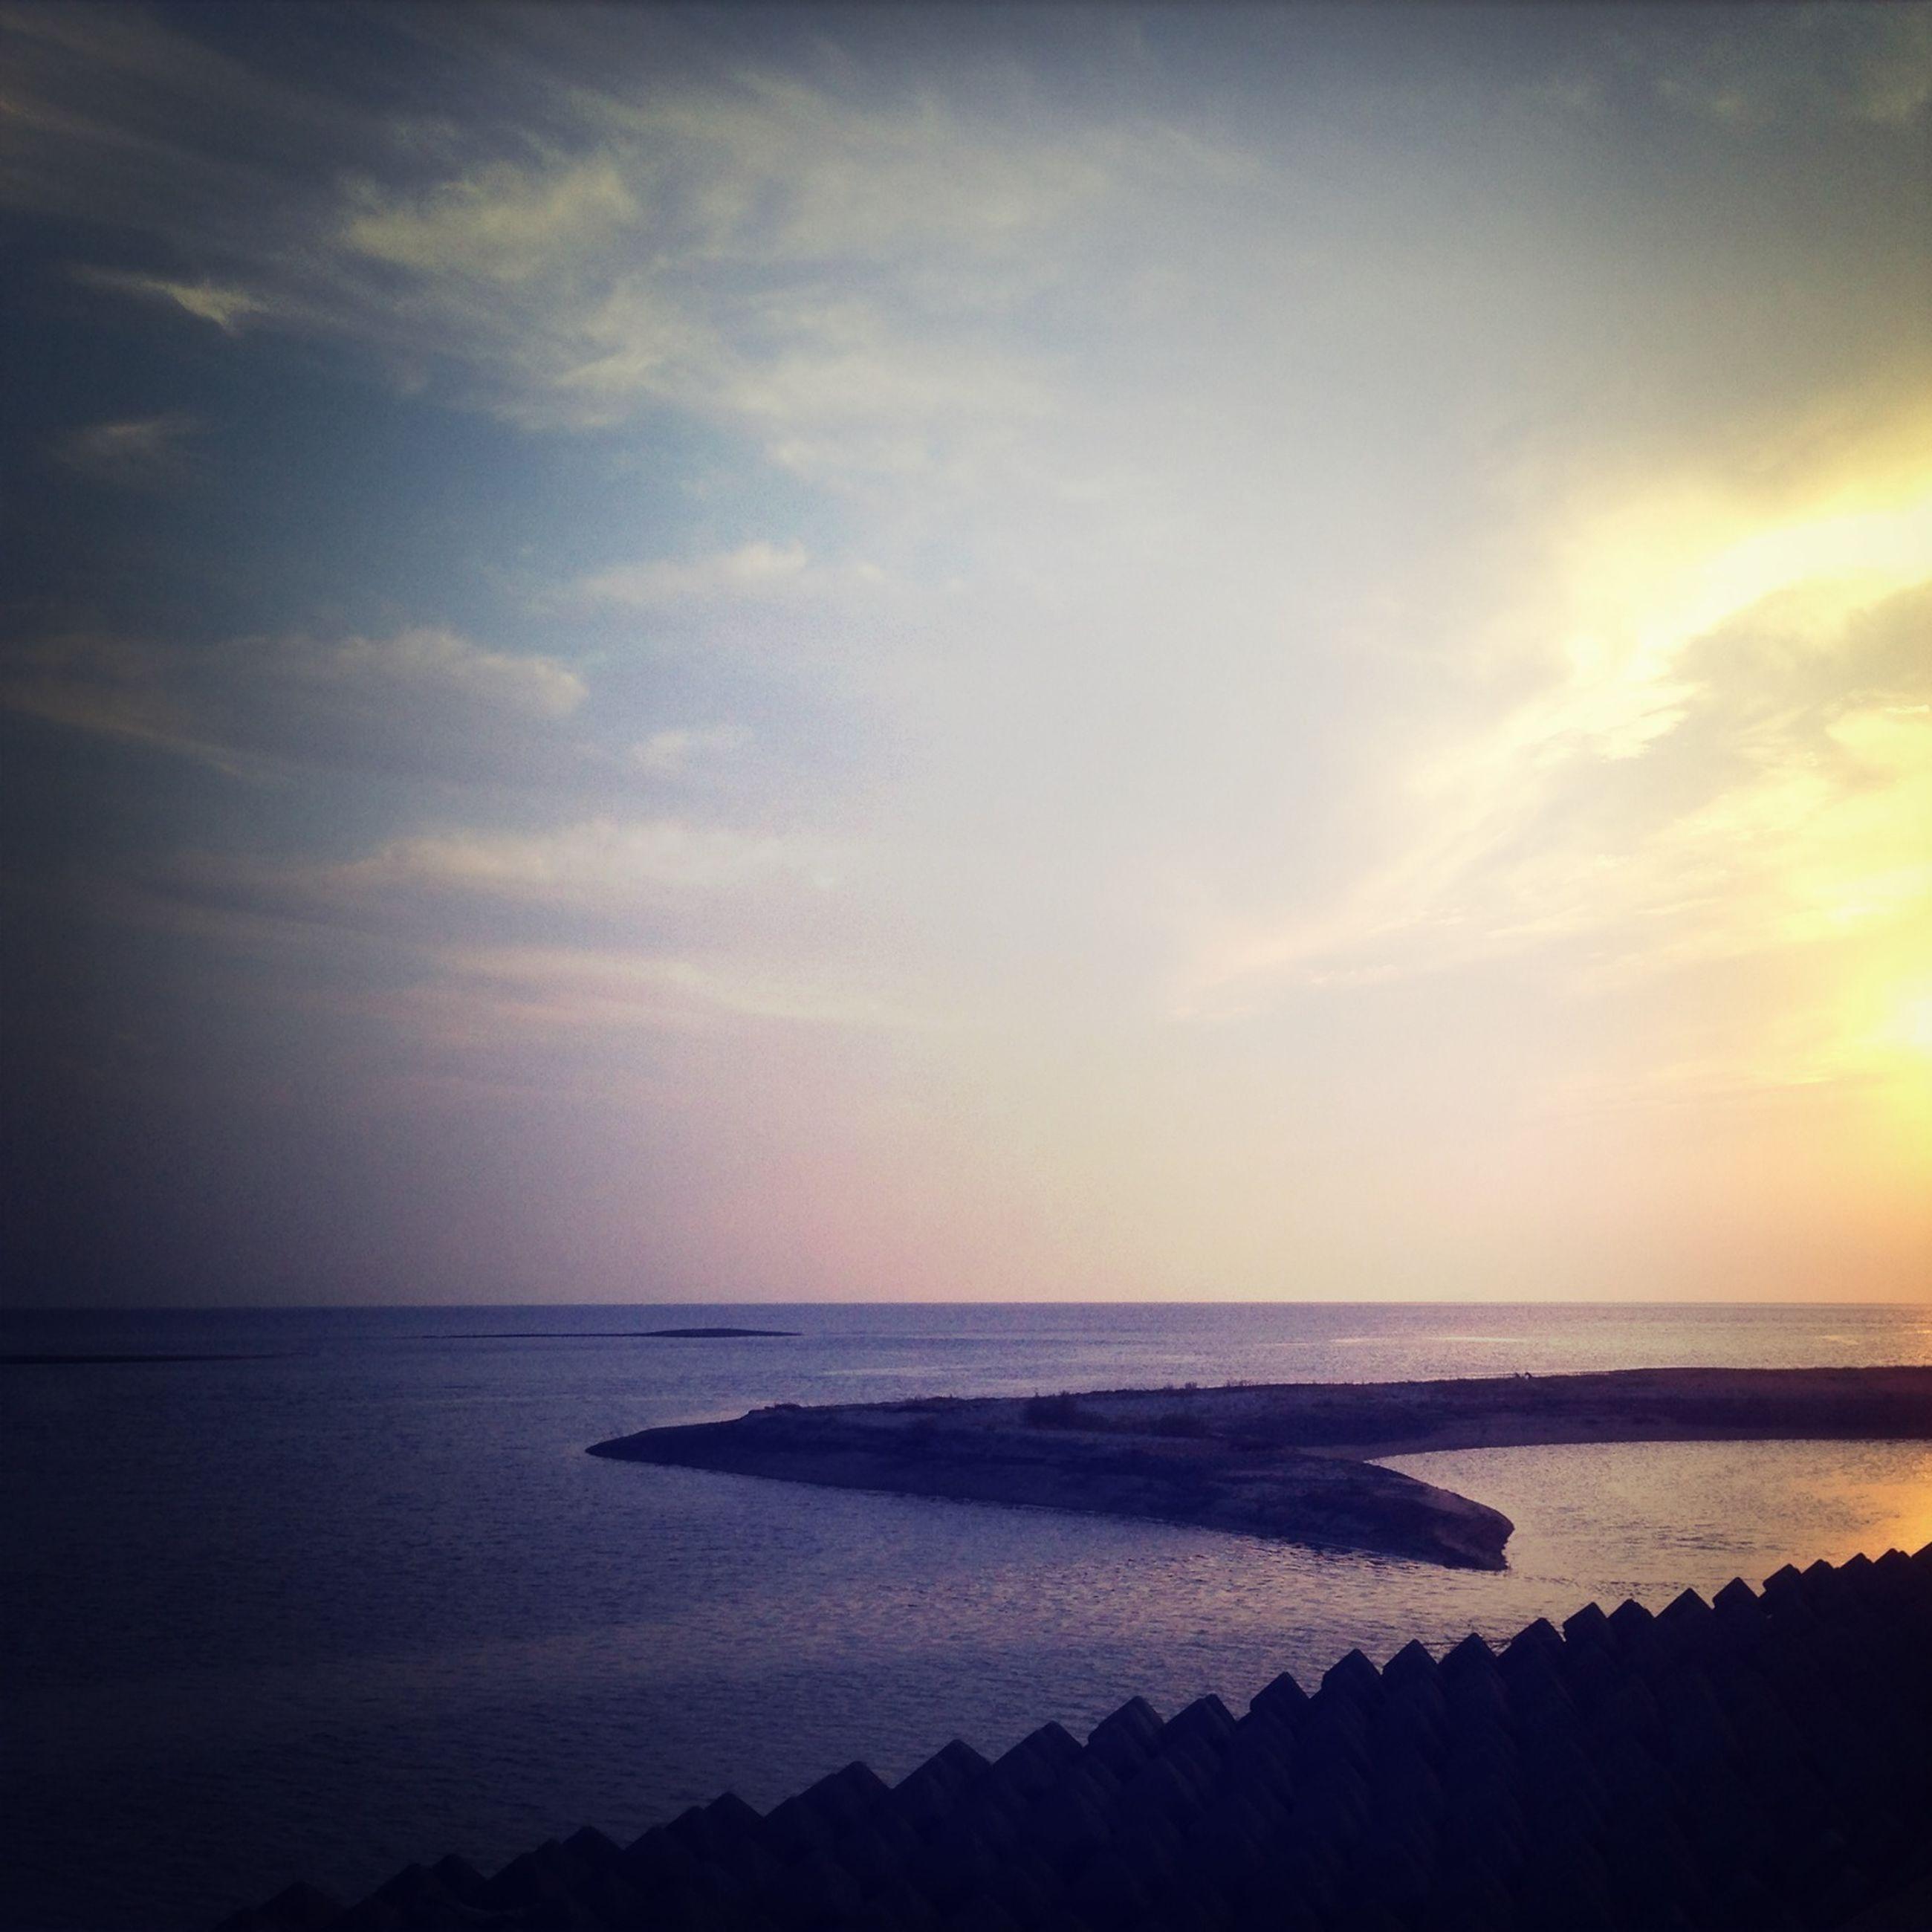 sea, horizon over water, water, sunset, scenics, tranquil scene, sky, beauty in nature, tranquility, beach, nature, shore, idyllic, orange color, cloud - sky, outdoors, no people, cloud, coastline, nautical vessel